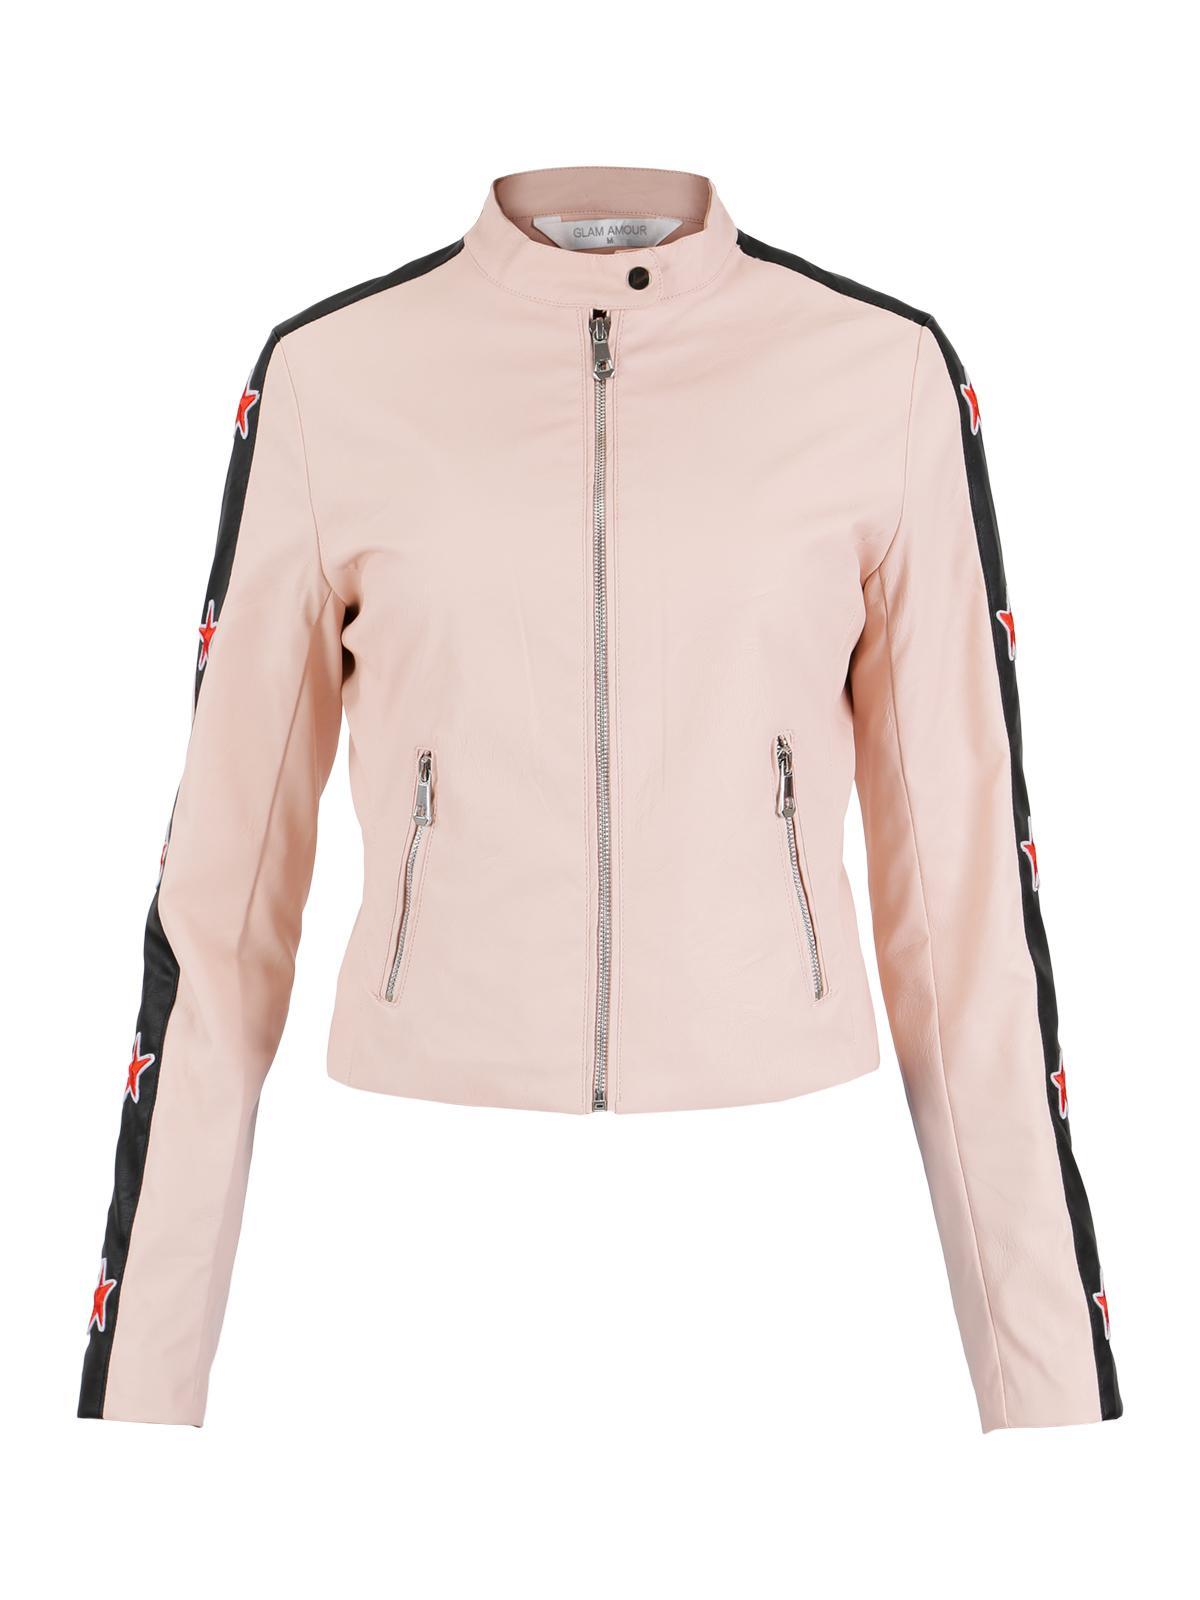 Abbracci Women Motorcycle White Faux Leather Jacket